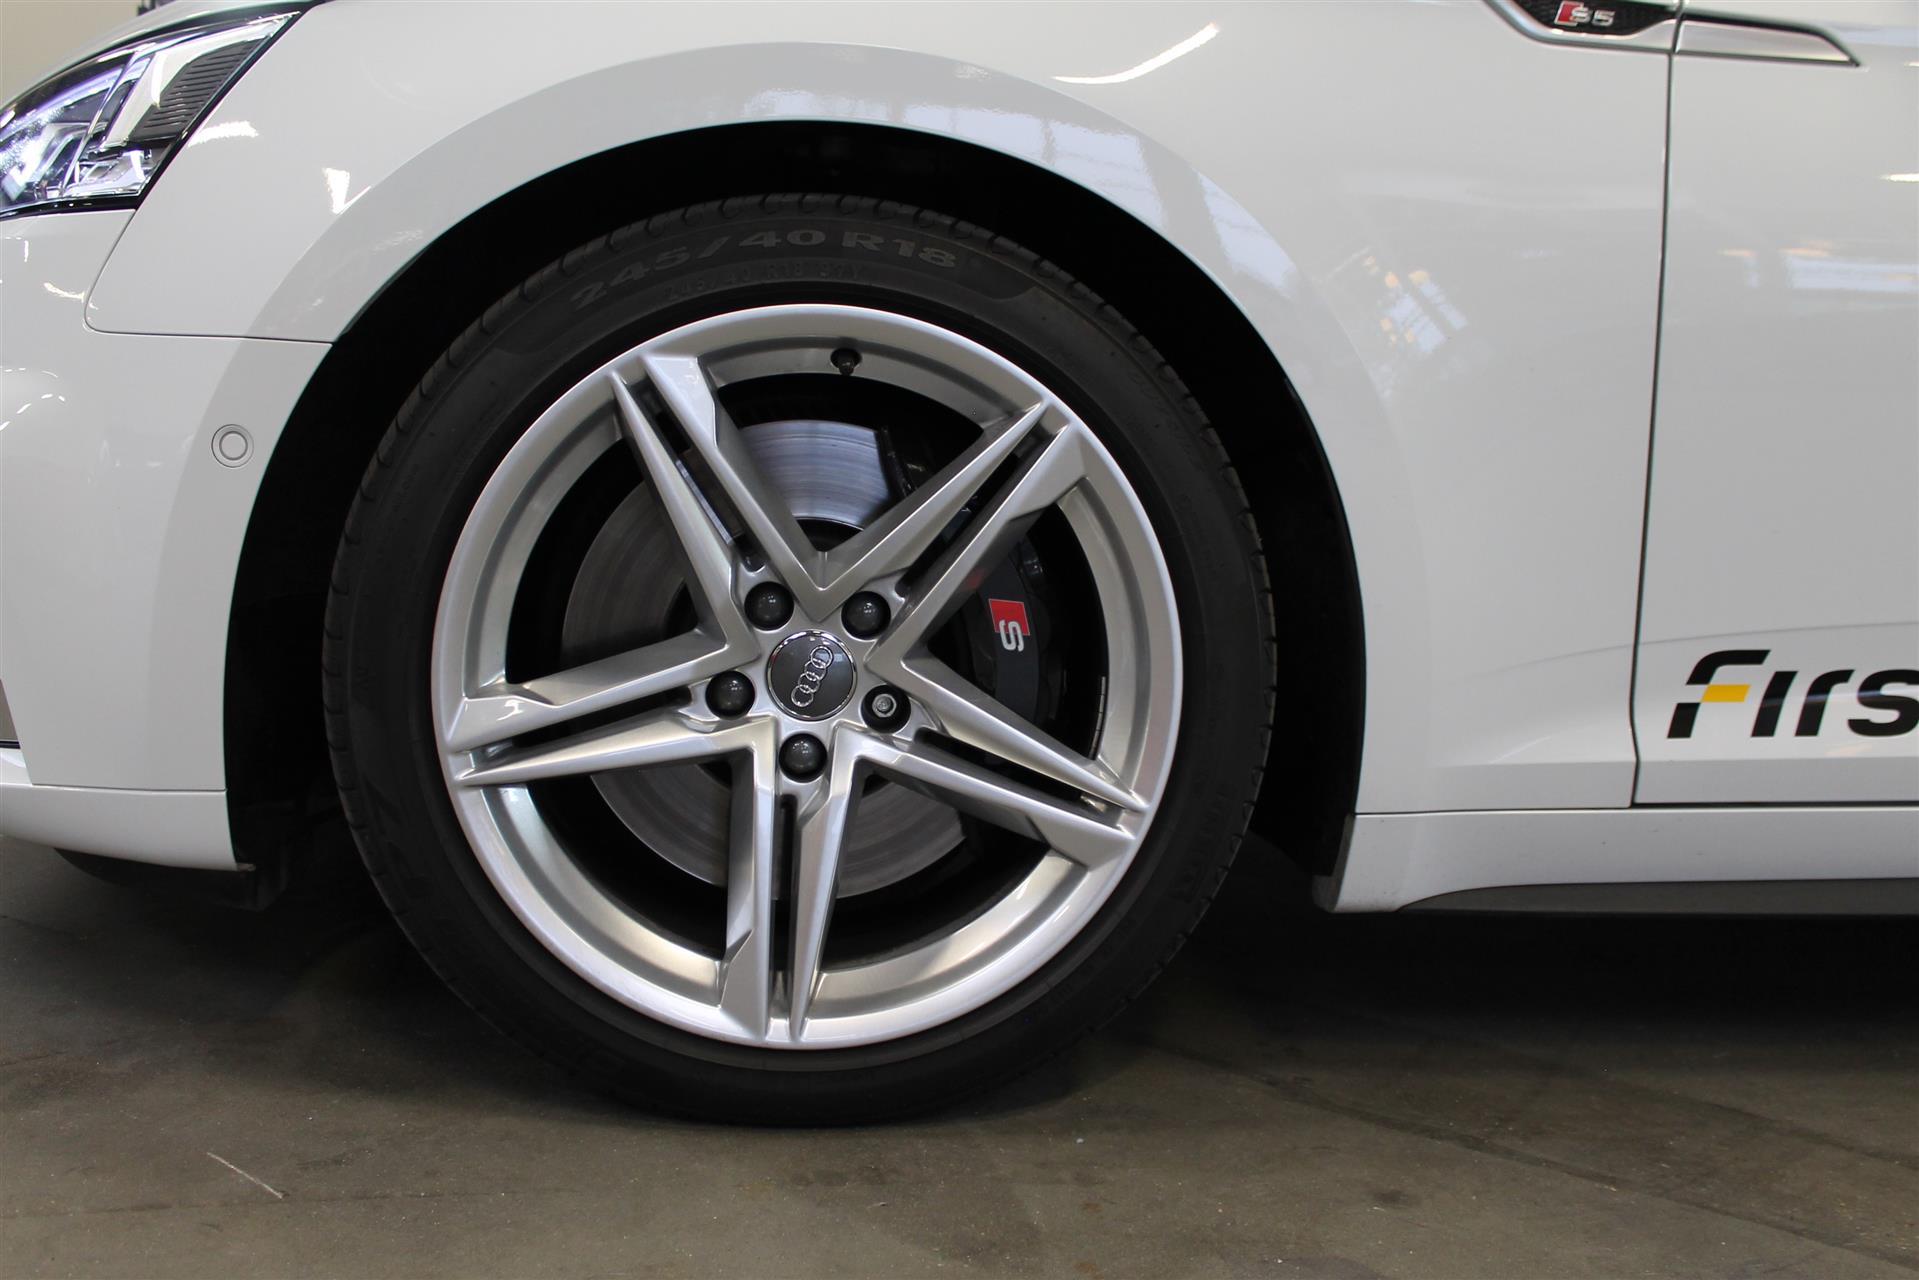 Sportback 3,0 TFSI Quattro Tiptr. 354HK 5d 8g Trinl. Gear image1